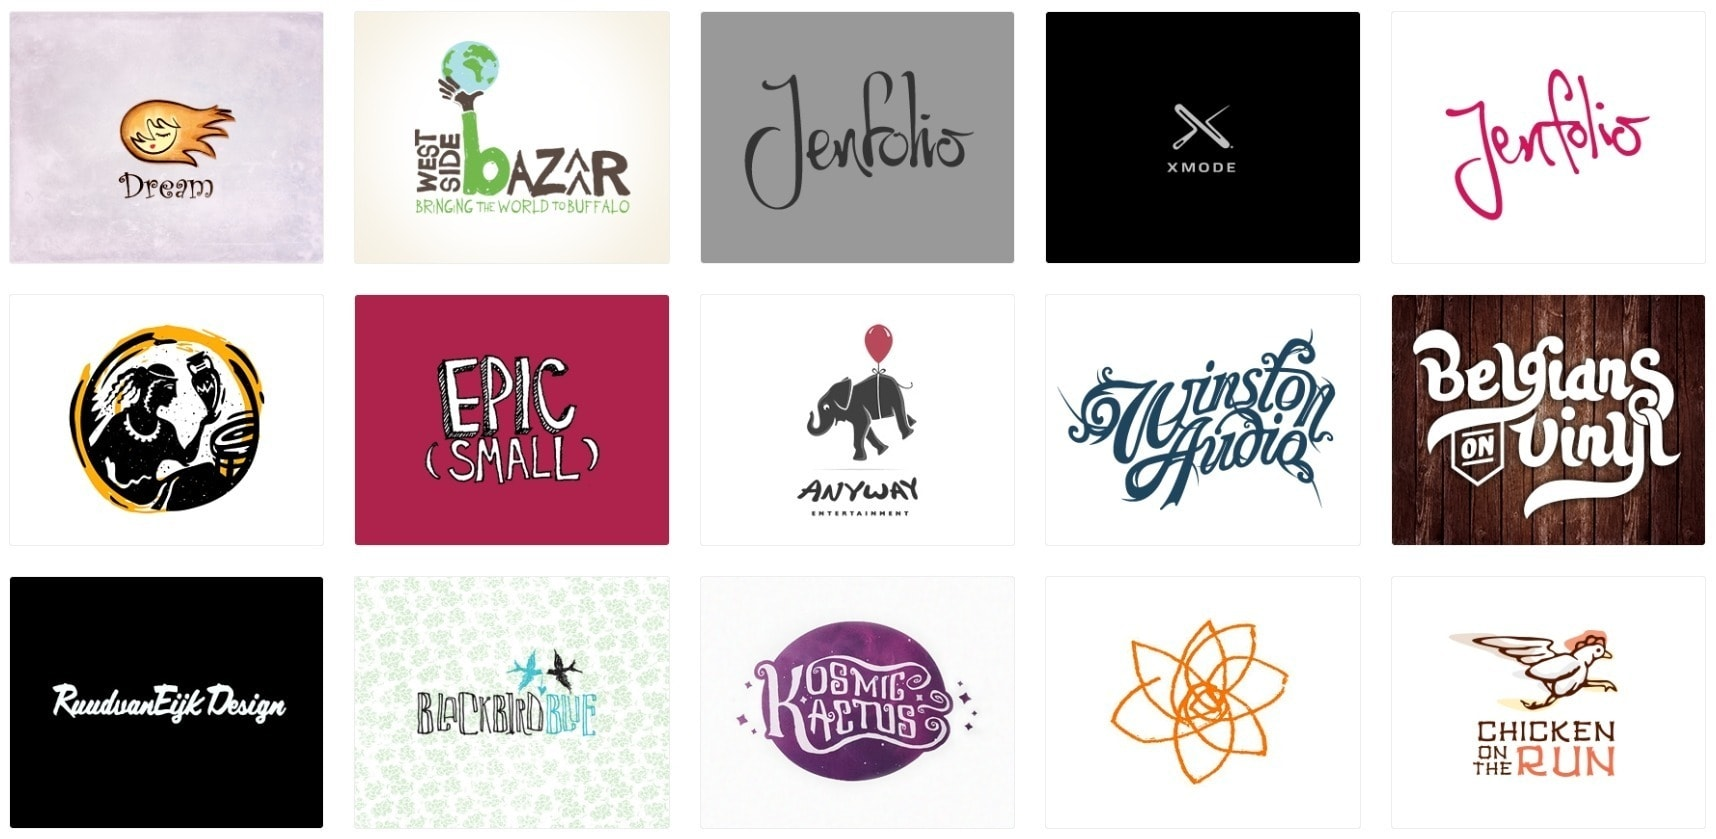 Logo Trends - Hand-Drawn Logos